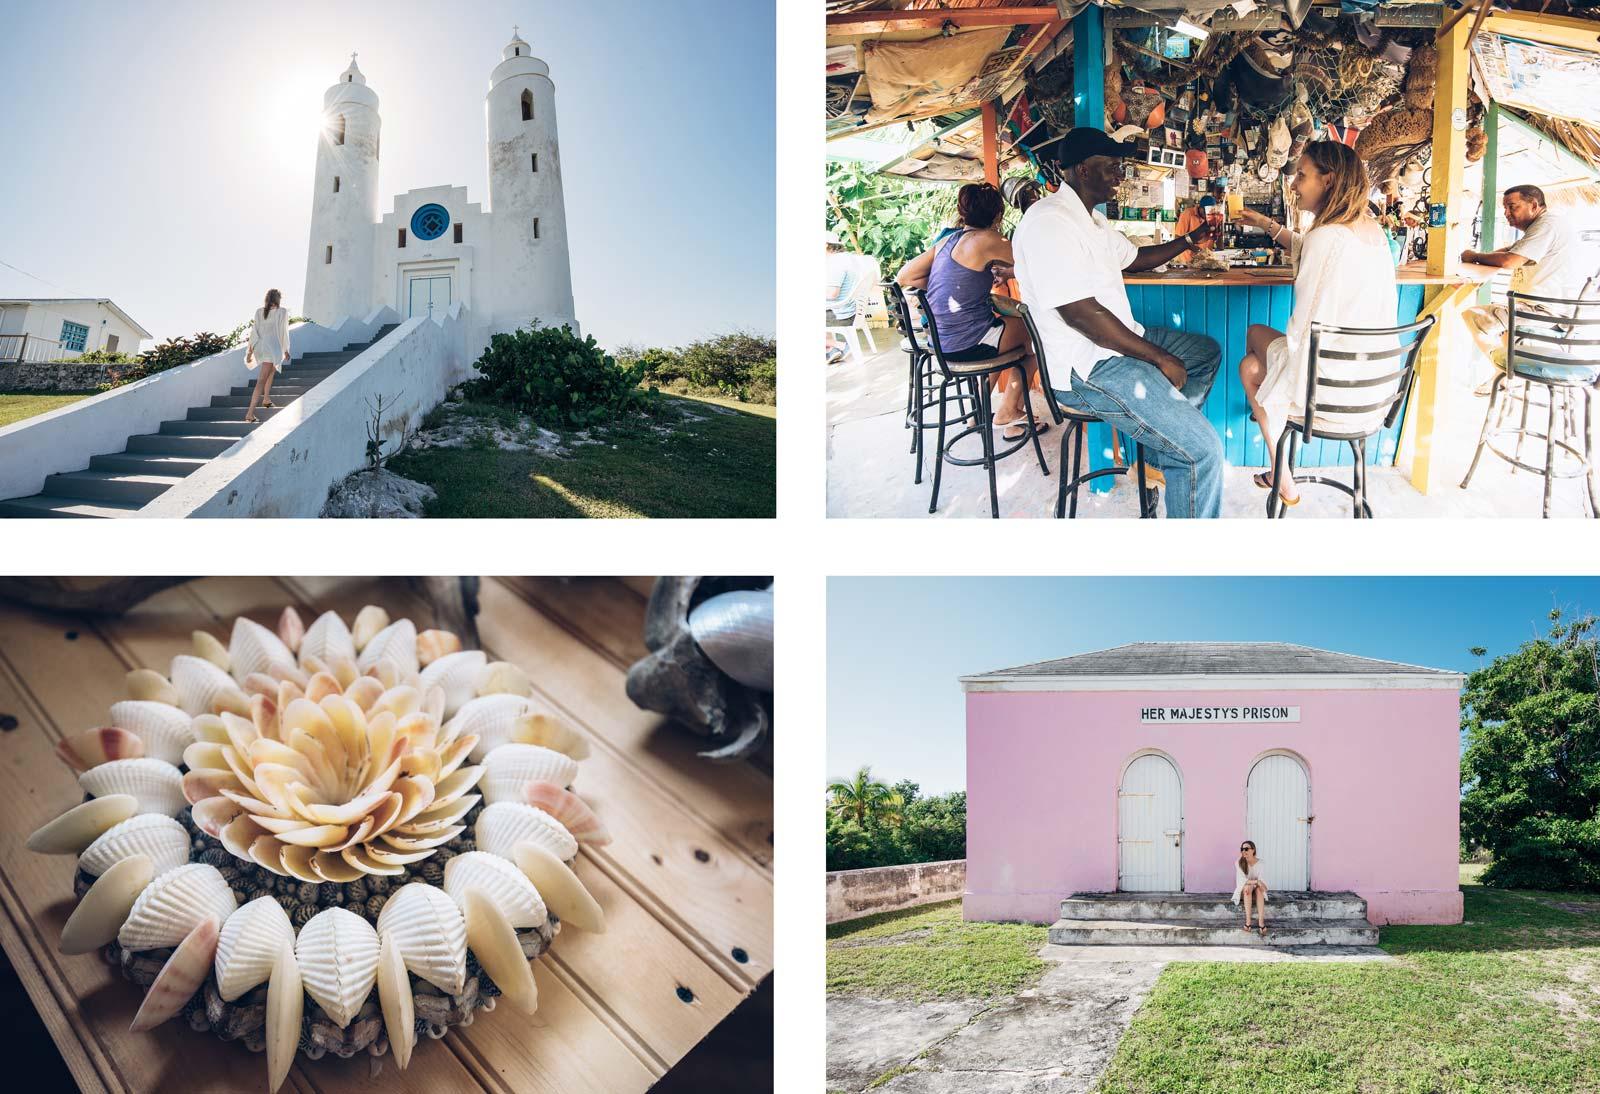 A visiter à Long Island, Bahamas